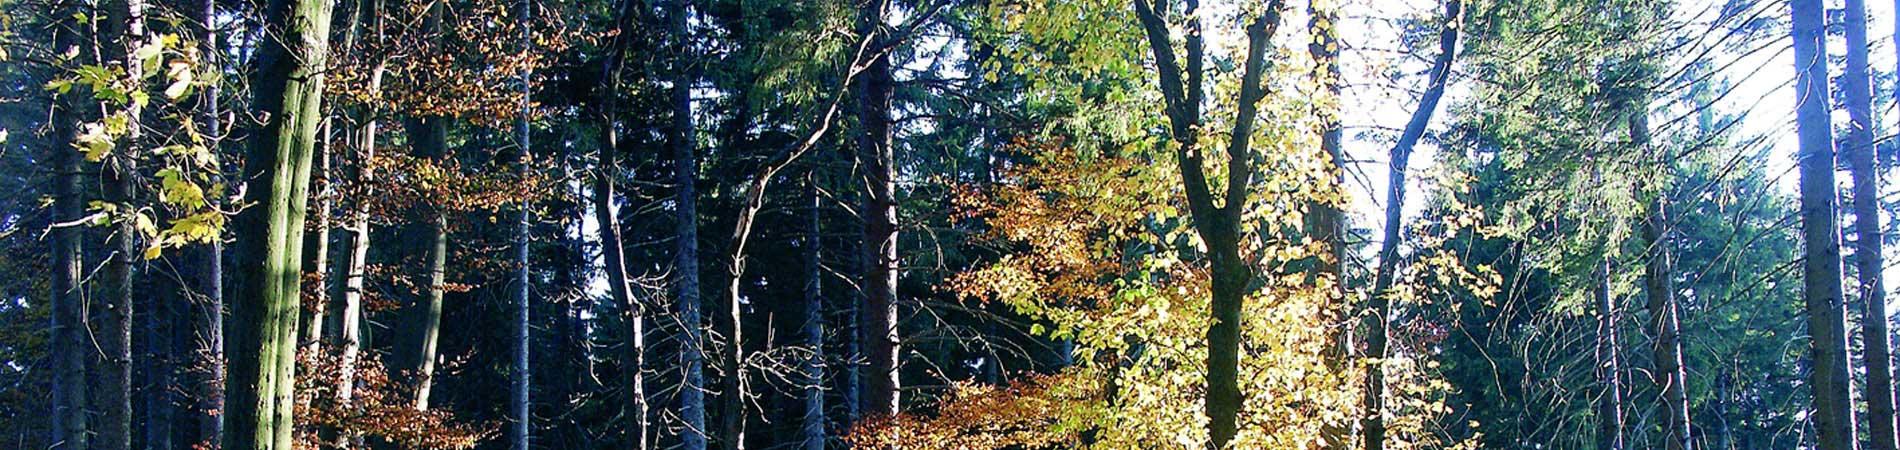 Herbst_wald.jpg